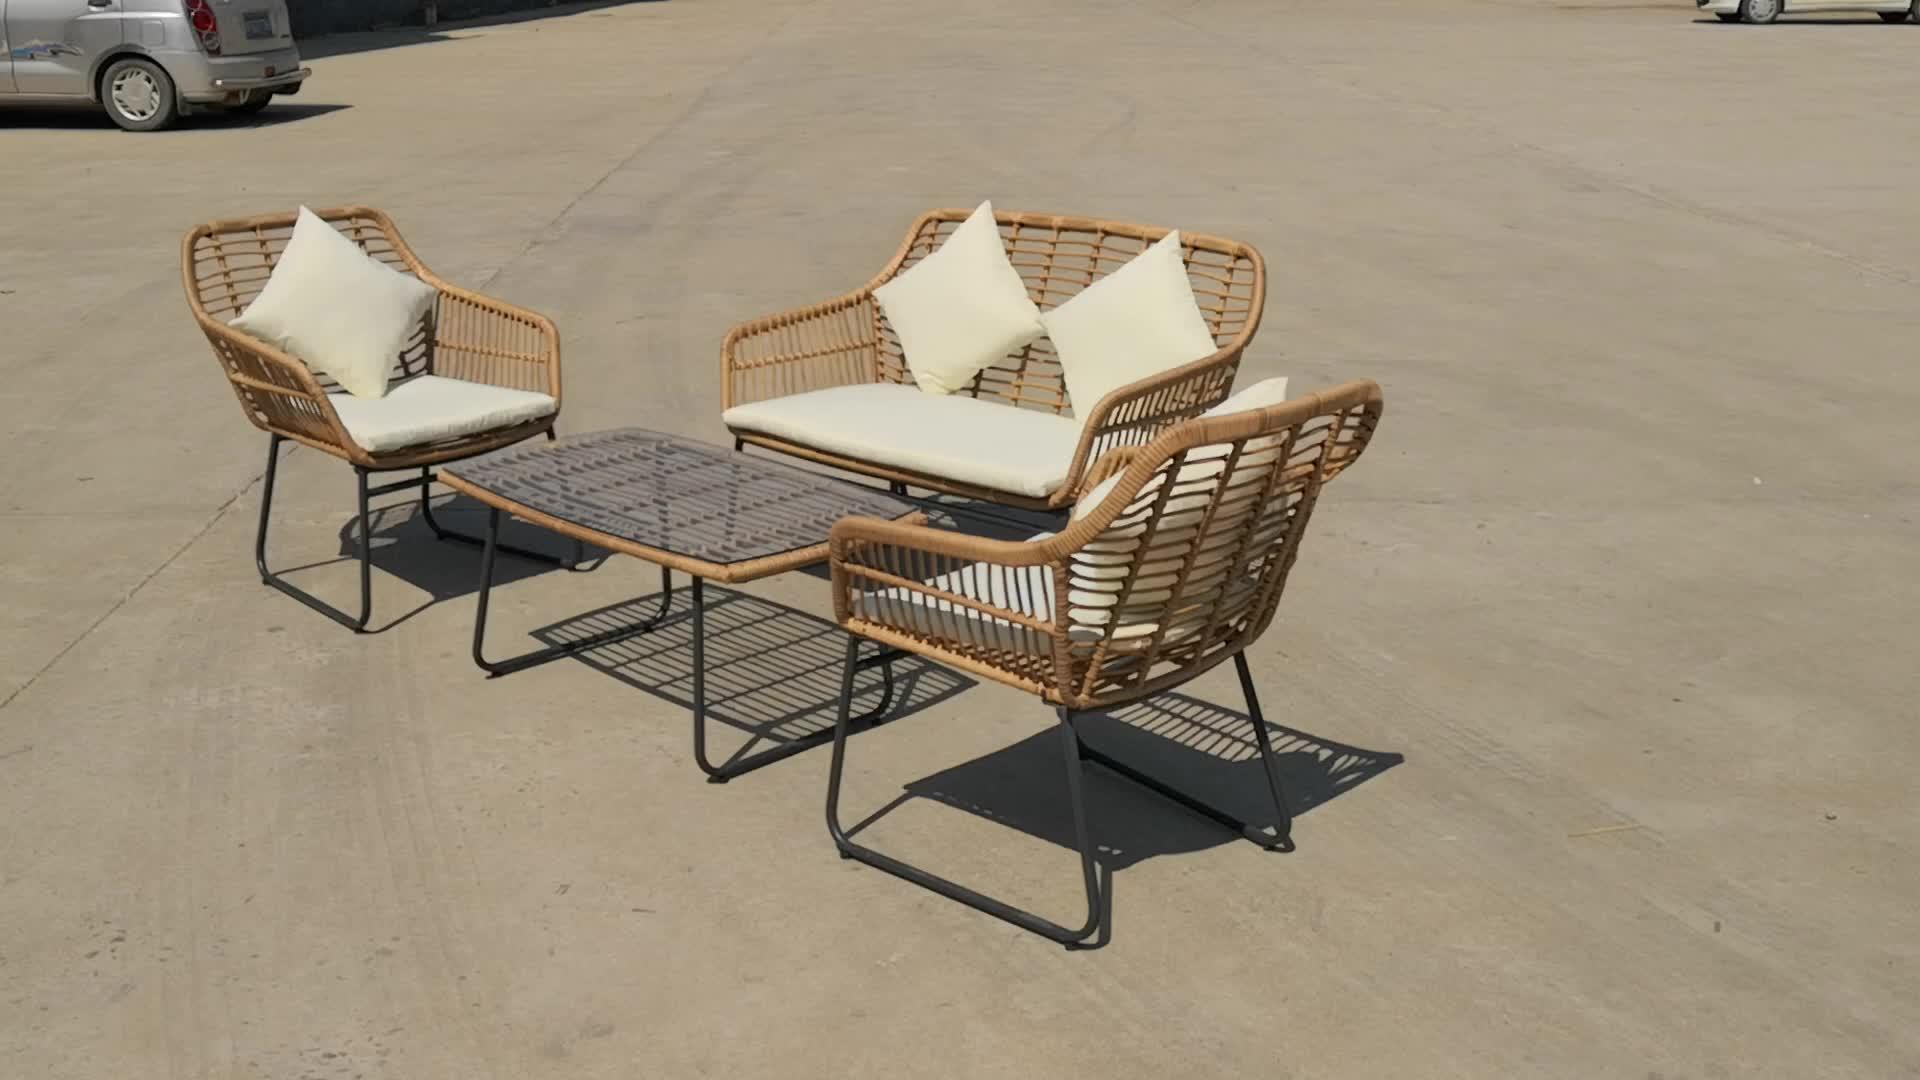 wholesale 4pcs patio garden rattan sofa set KD poly big round rattan wicker outdoor leisure furniture